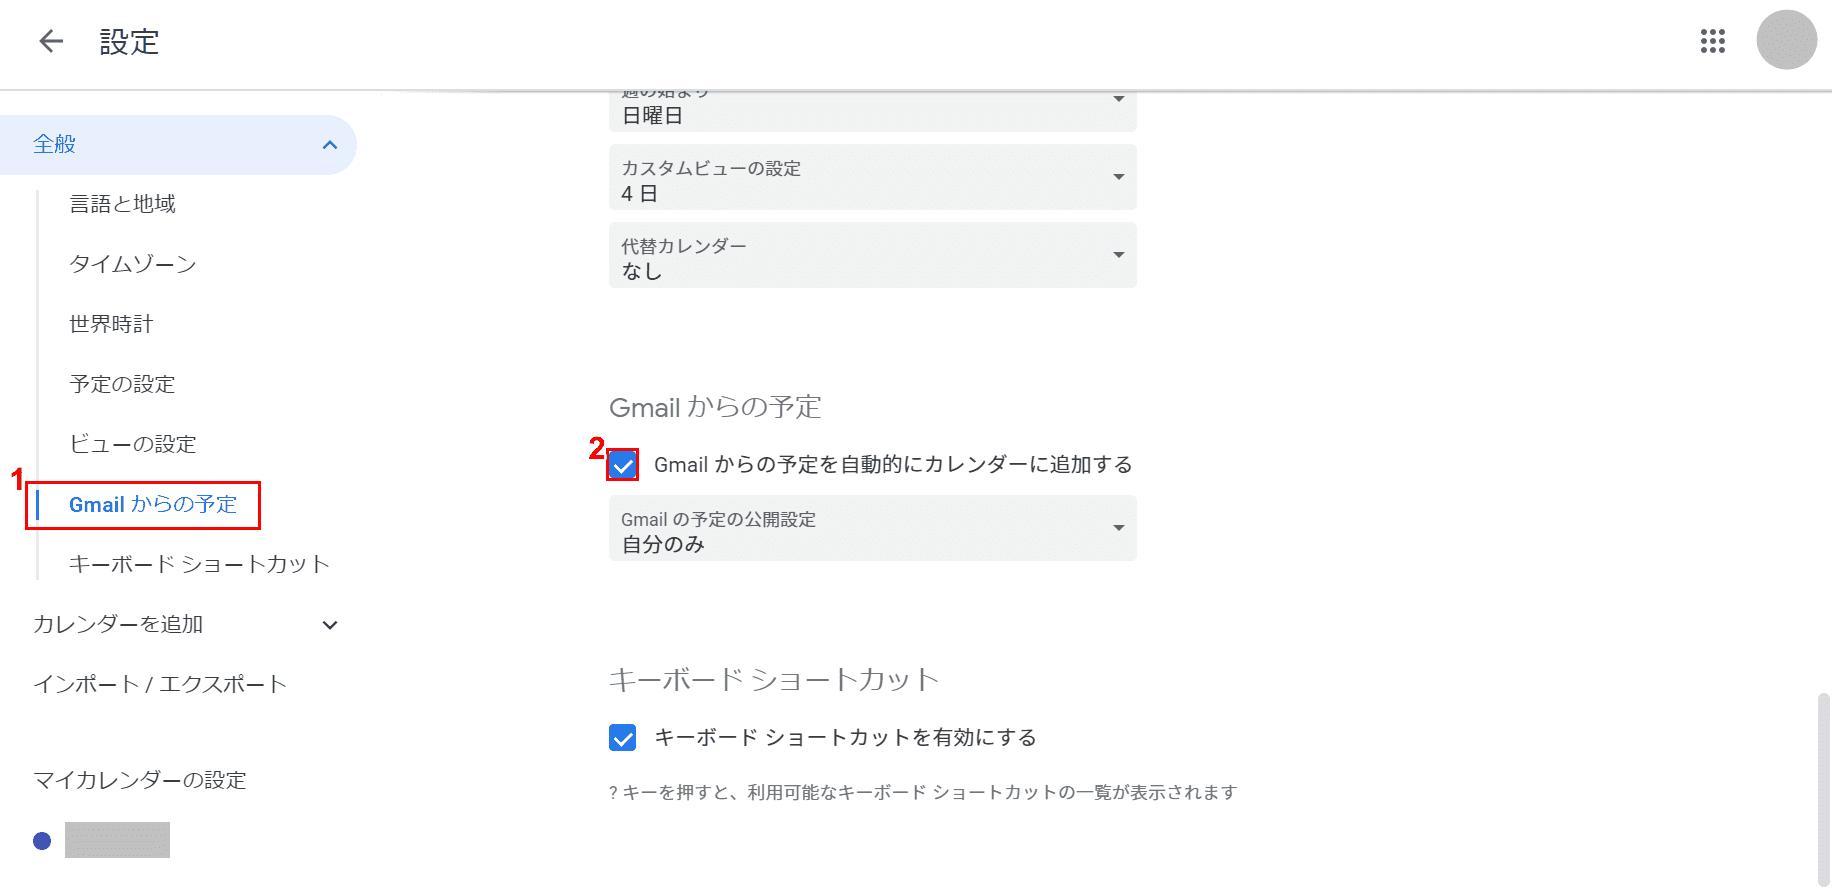 Gmailからの予定を自動的にカレンダーに追加する